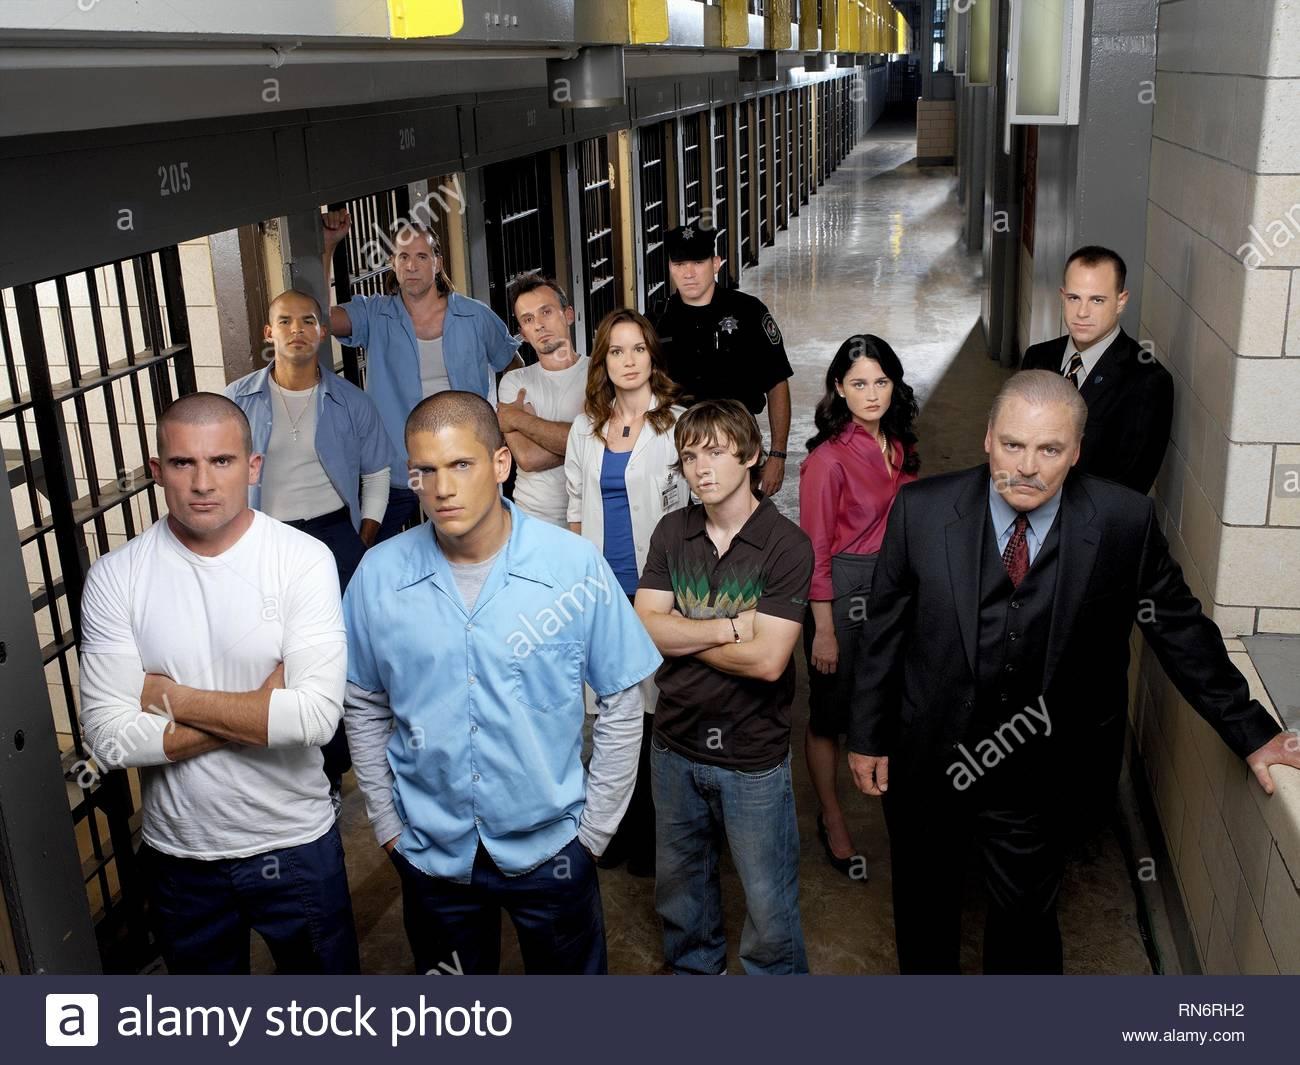 PRISON BREAK : SEASON 1, WENTWORTH MILLER, DOMINIC PURCELL, AMAURY NOLASCO, PETER STORMARE, ROBERT KNEPPER, SARAH WAYNE CALLIES, WADE WILLIAMS - Stock Image